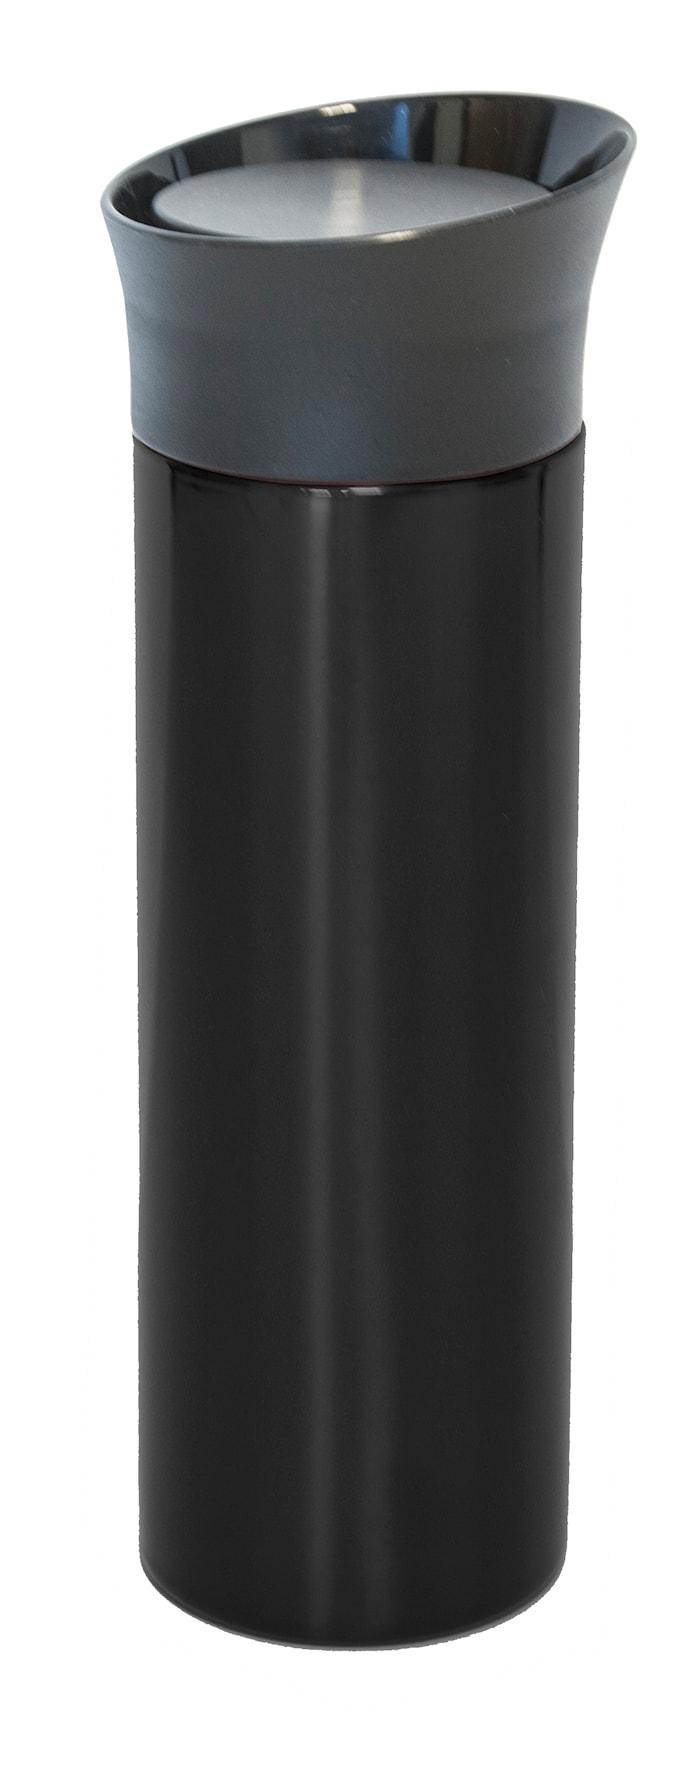 Bilmugg rak stor svart